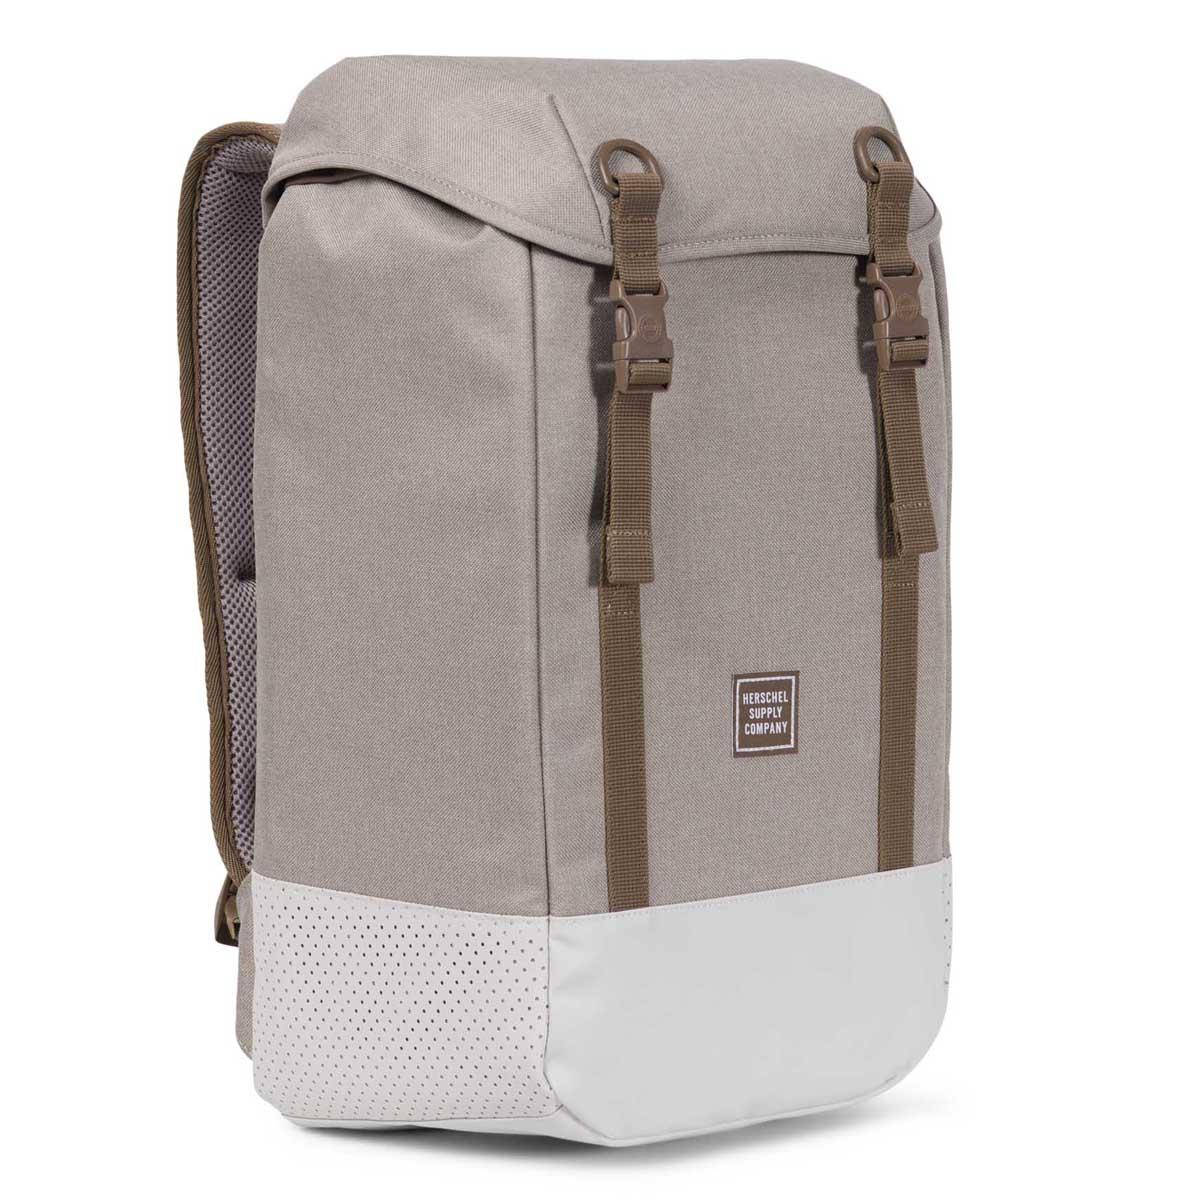 e4b5c45fc2 Herschel Supply Co. - Natural Light Khaki Crosshatch Iona Backpack - Lyst.  View fullscreen